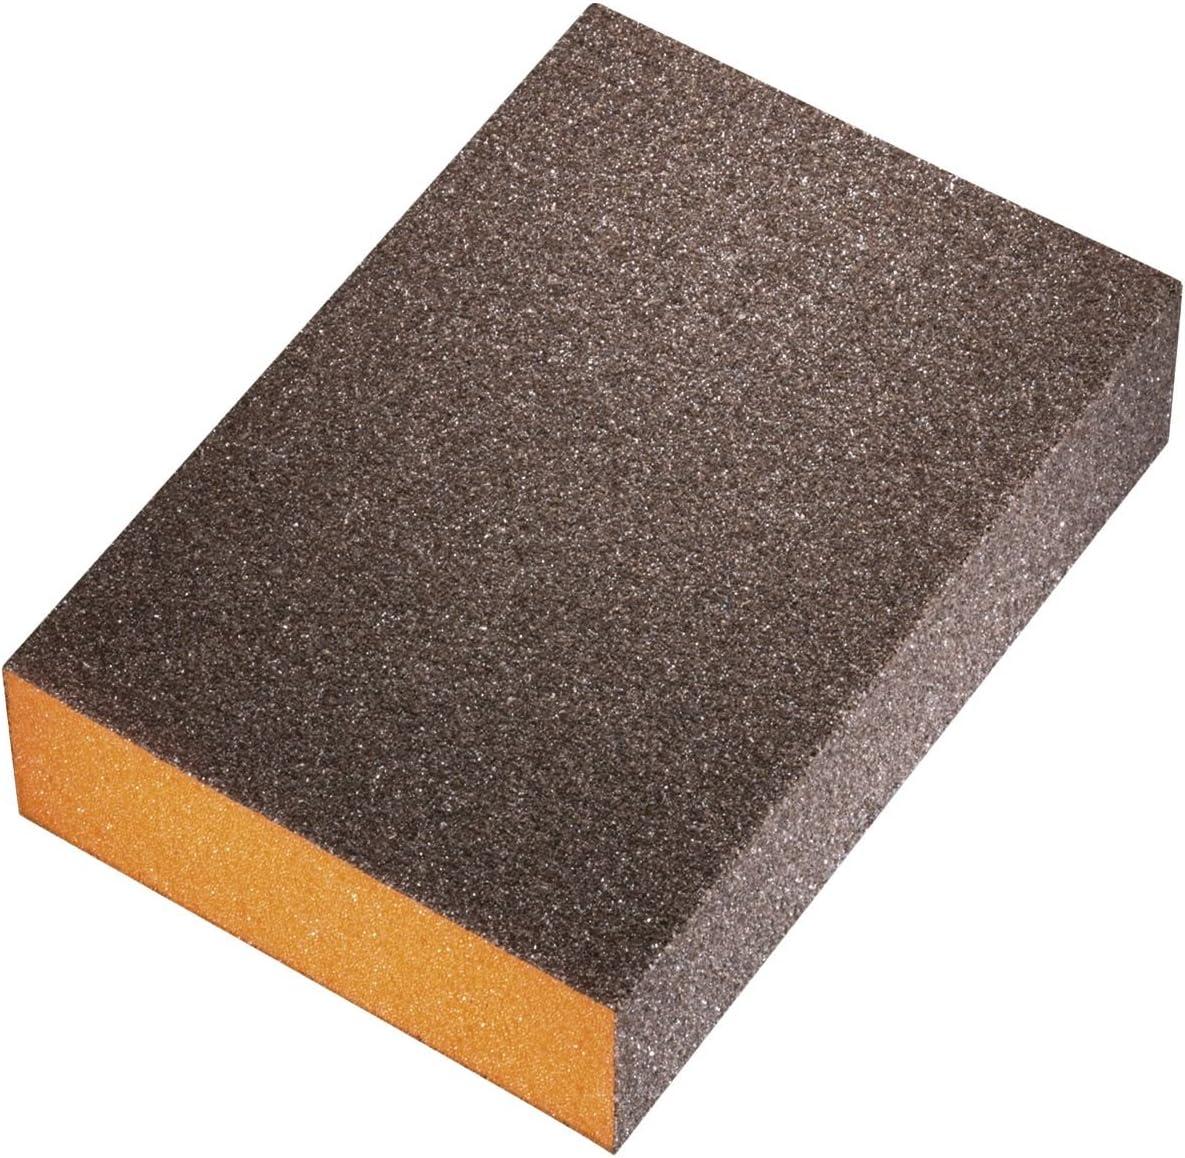 Sia Sanding Block Soft 7991 98/x 69/x 26/mm Orange Pack of 1 F03E00R8/K1